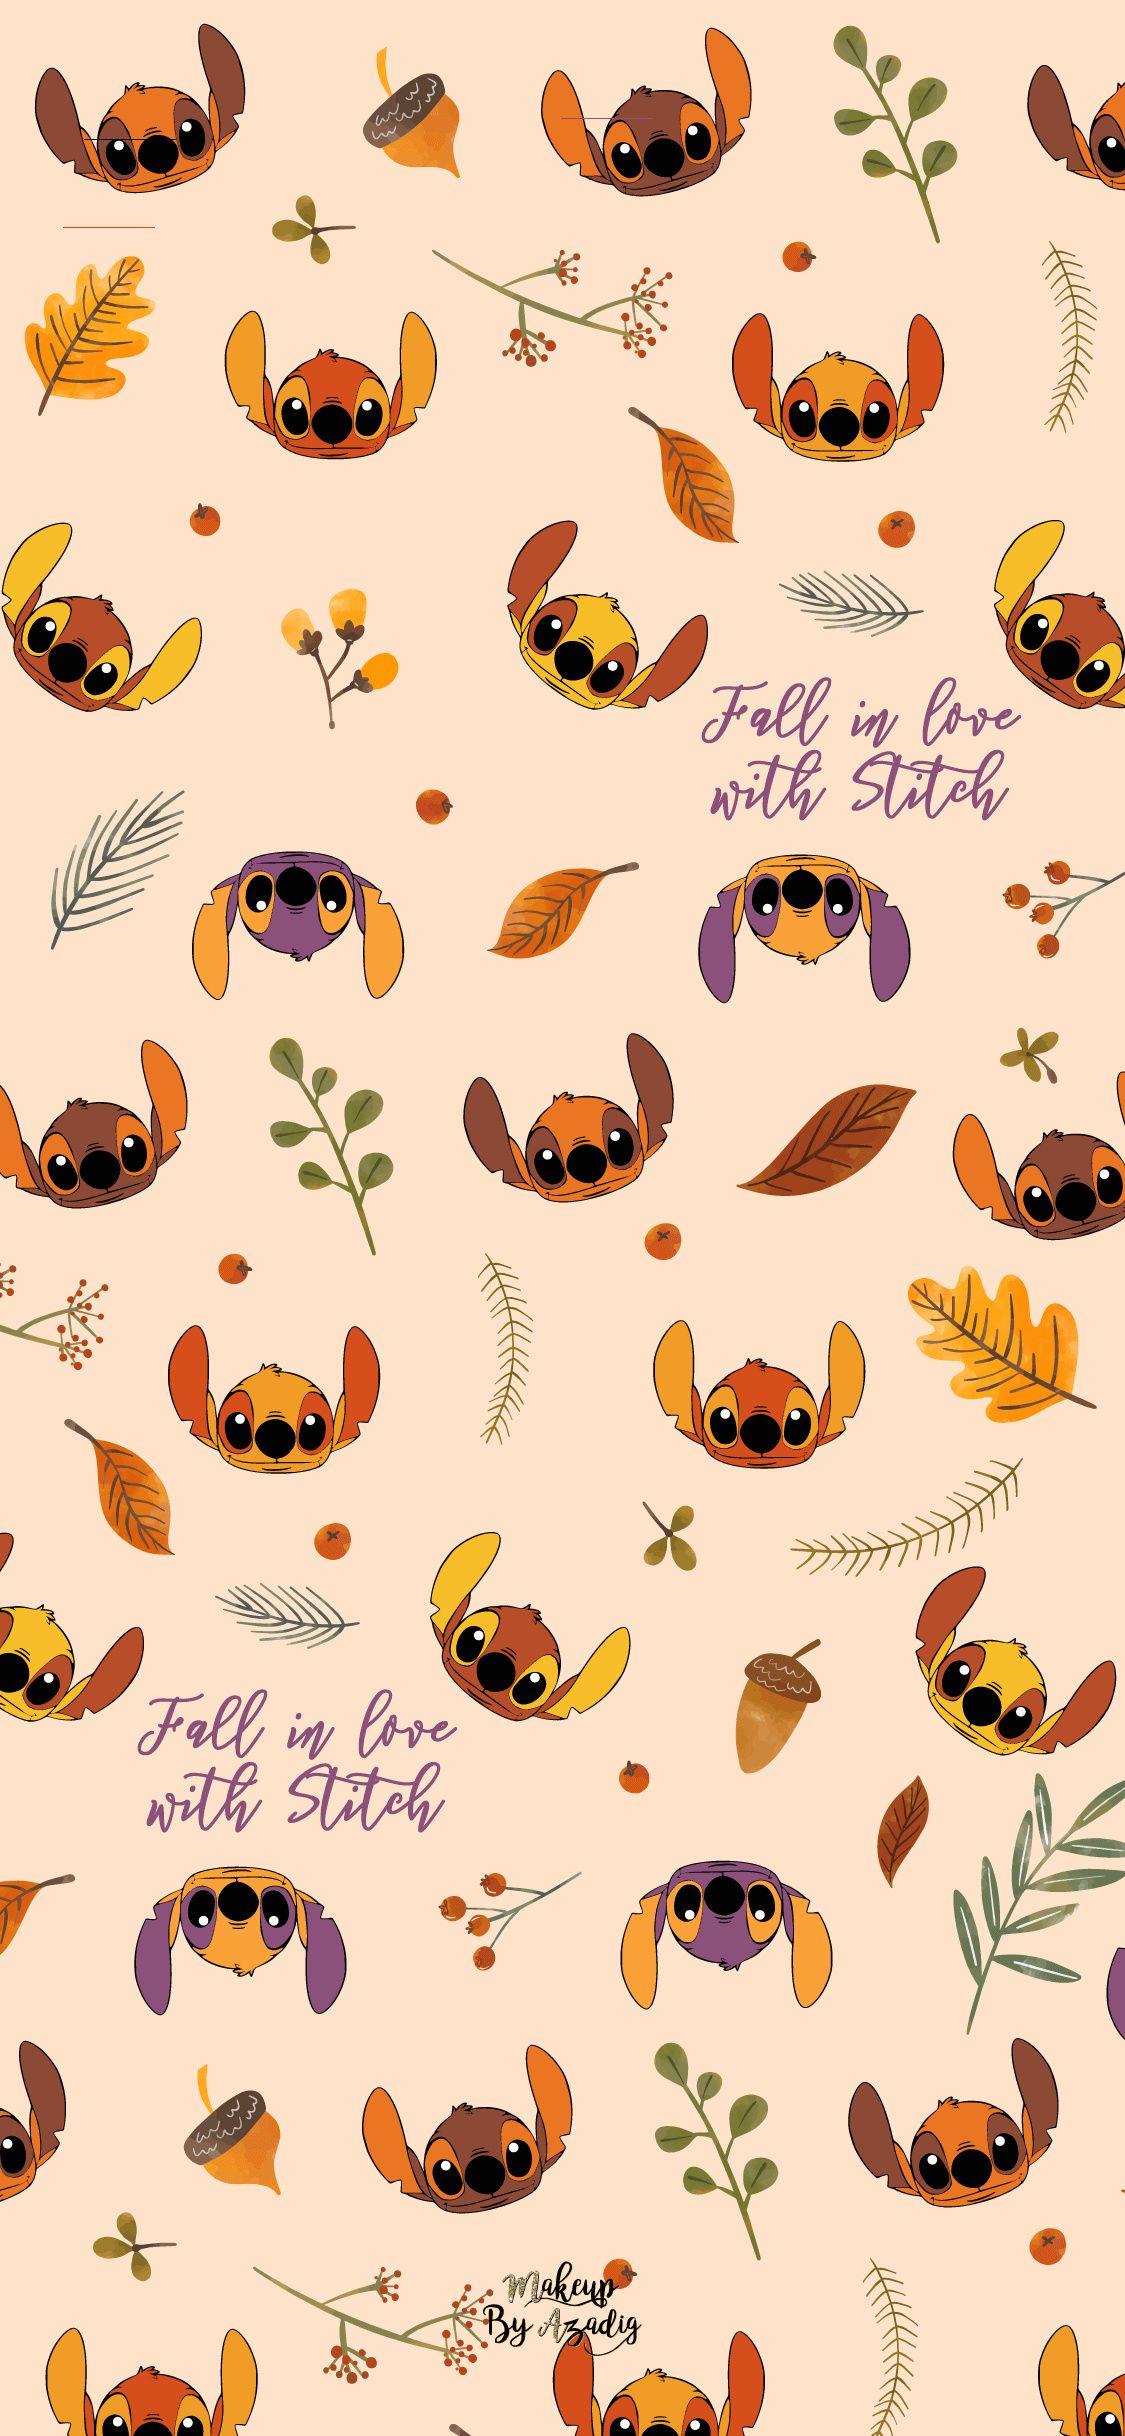 8 Fond D Ecran Disney Stitch Fall Fallwallpapers In 2020 Wallpaper Iphone Disney Iphone Wallpaper Fall Wallpaper Iphone Cute